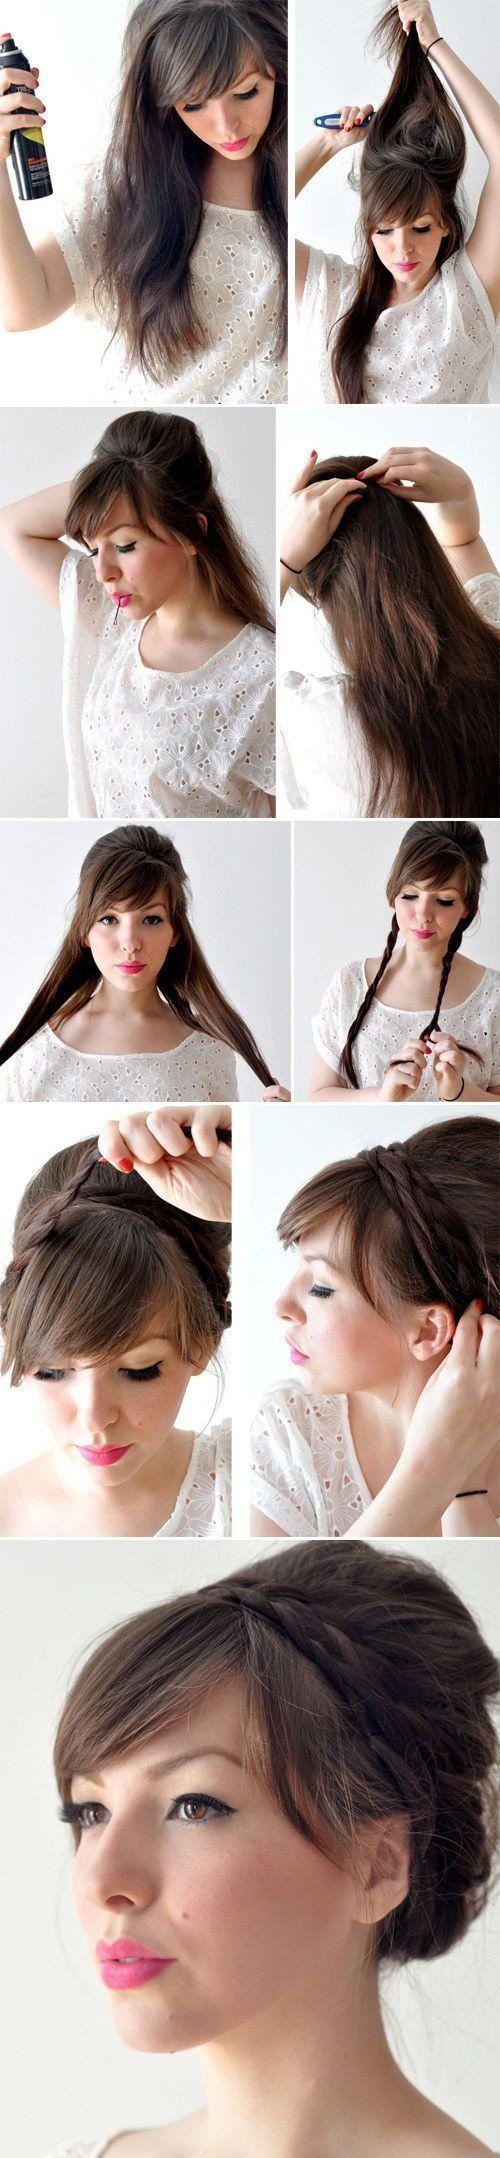 "Check out Nattha Pinsuwan's ""Braid poof-pretty hair"" decalz @Lockerz http://lockerz.com/d/19727450?ref=22084722"